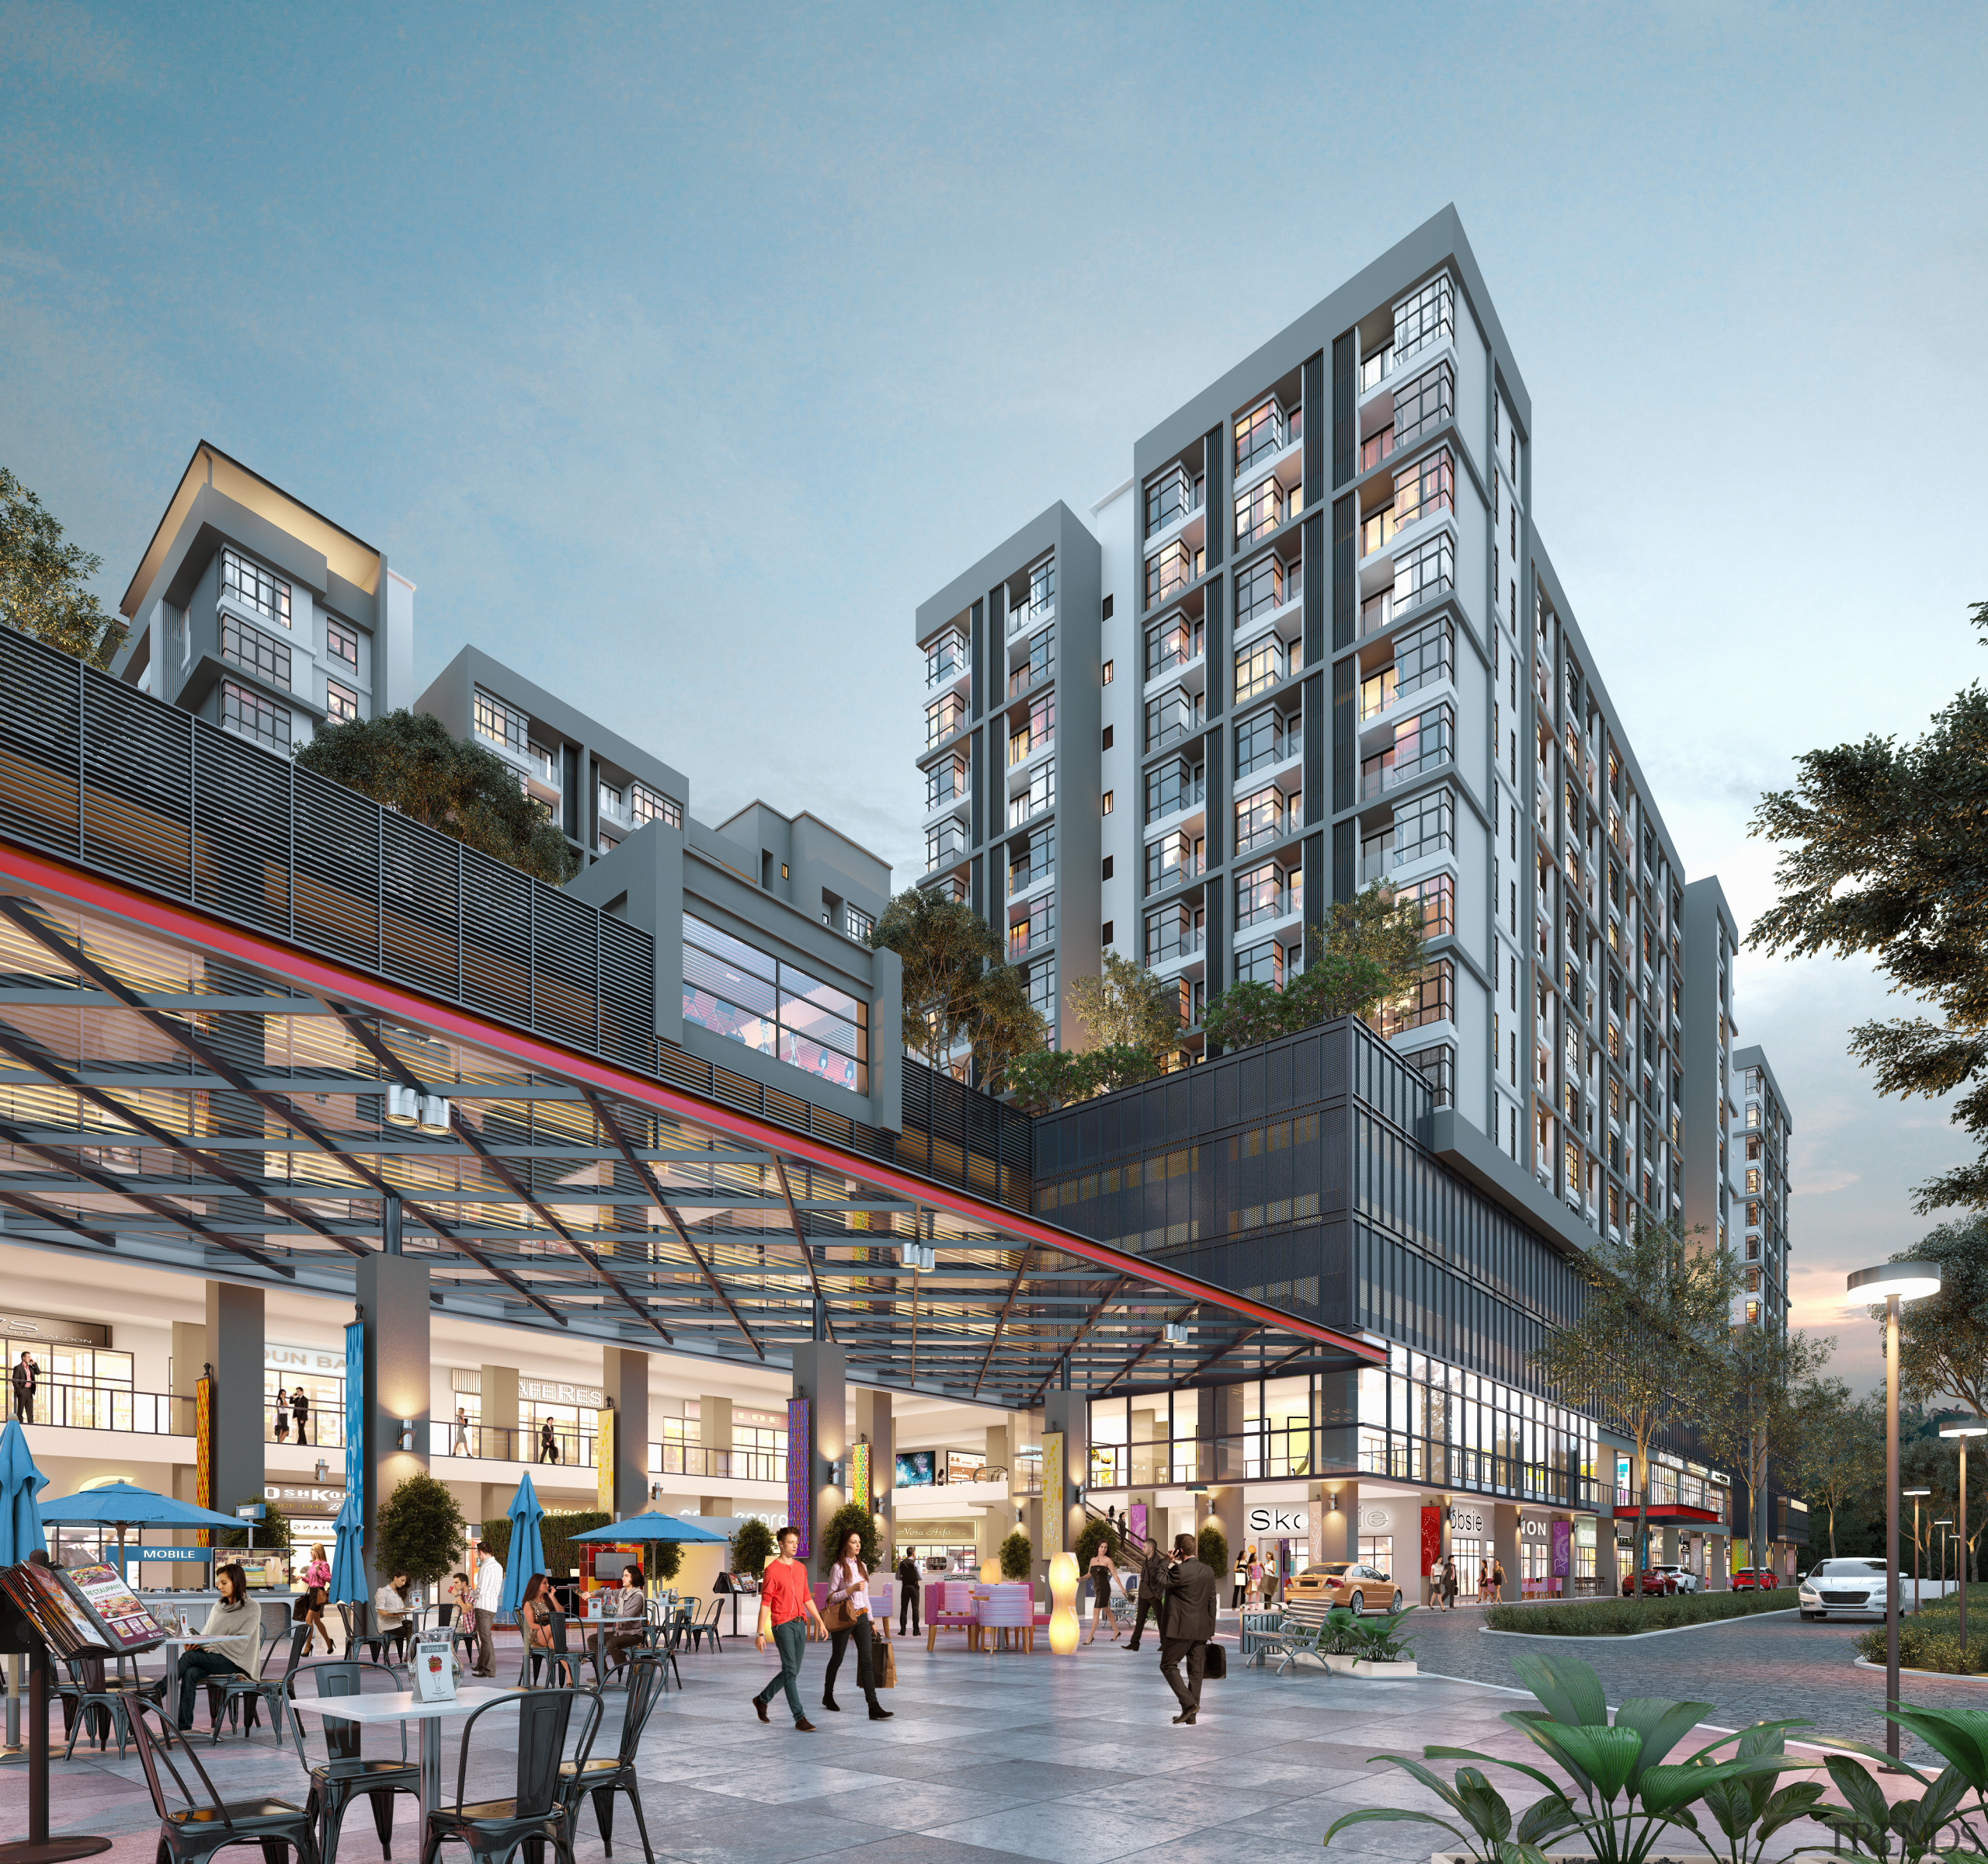 The 11,148m² Utropolis Marketplace enhances the appeal of building, city, commercial building, condominium, metropolis, metropolitan area, mixed use, neighbourhood, plaza, real estate, residential area, shopping mall, urban design, gray